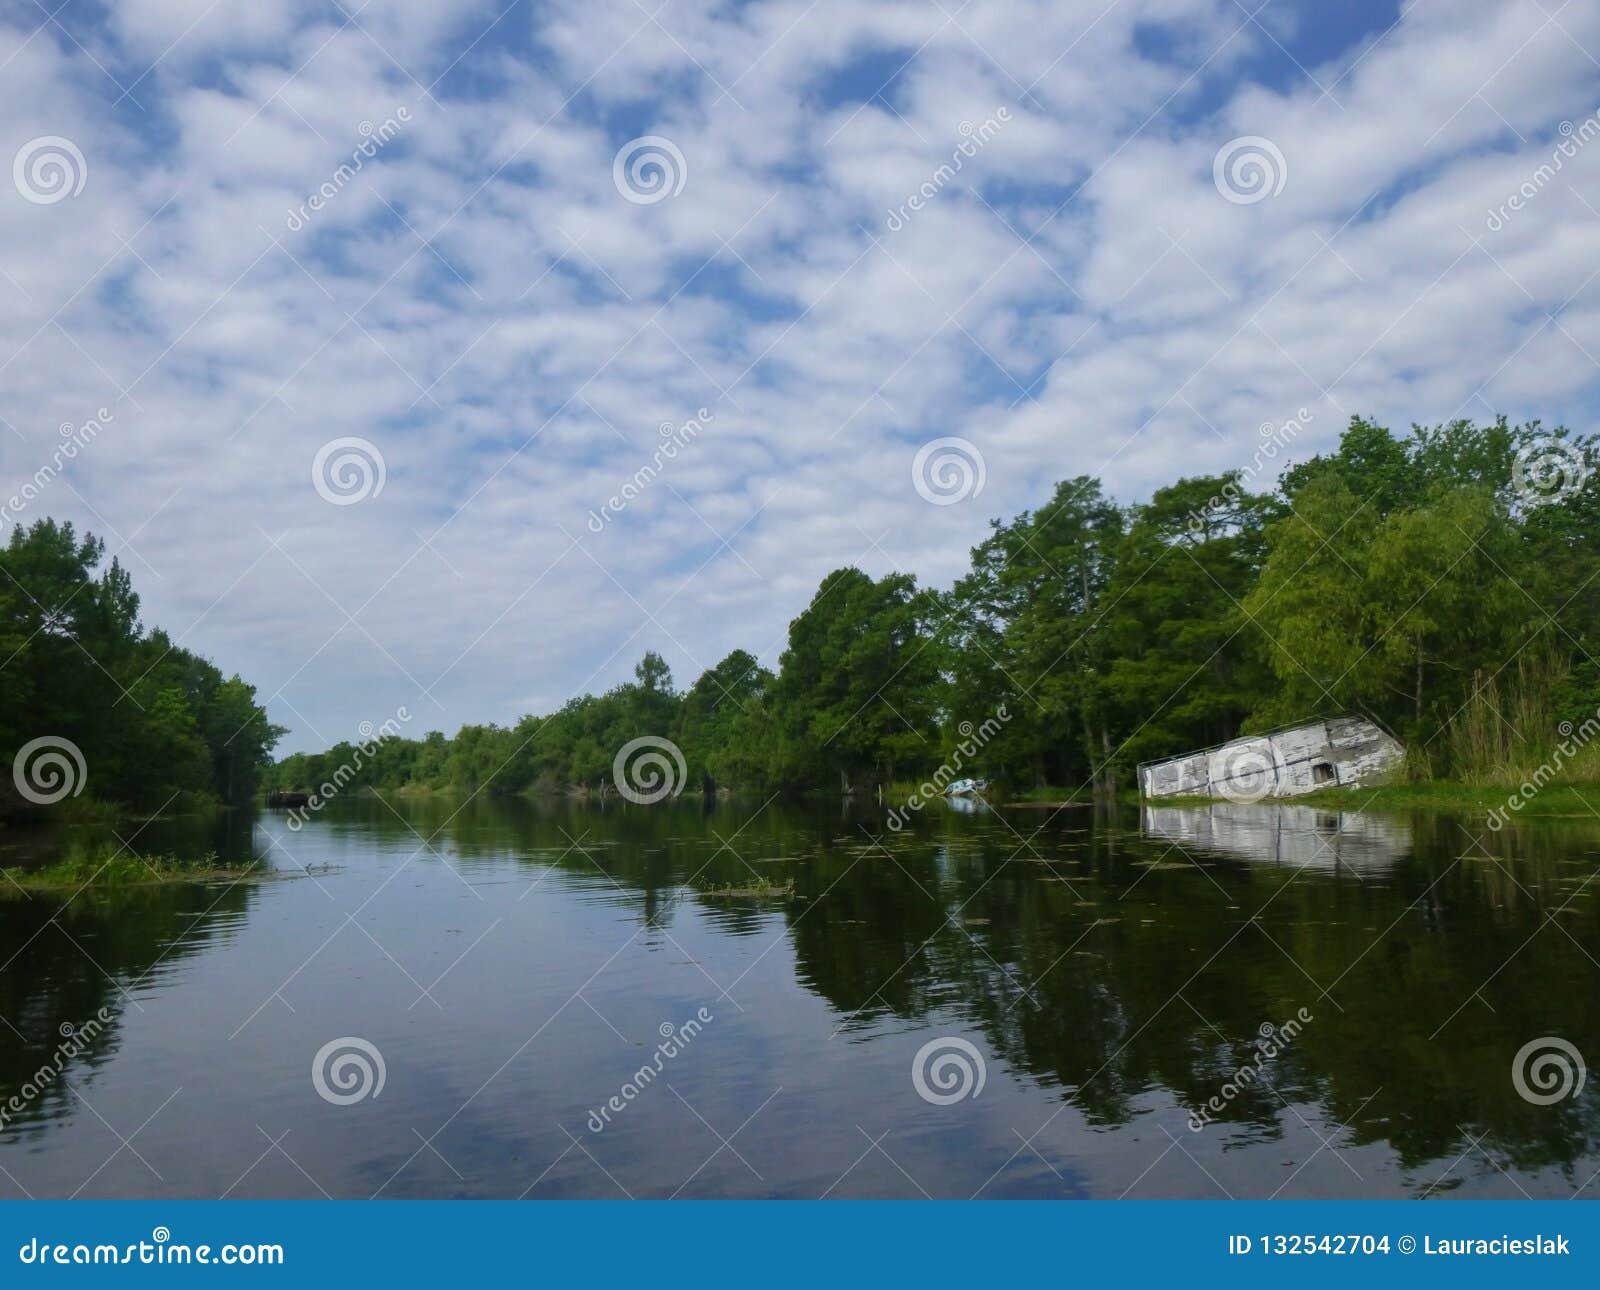 Louisiana swamp with an abandoned boat